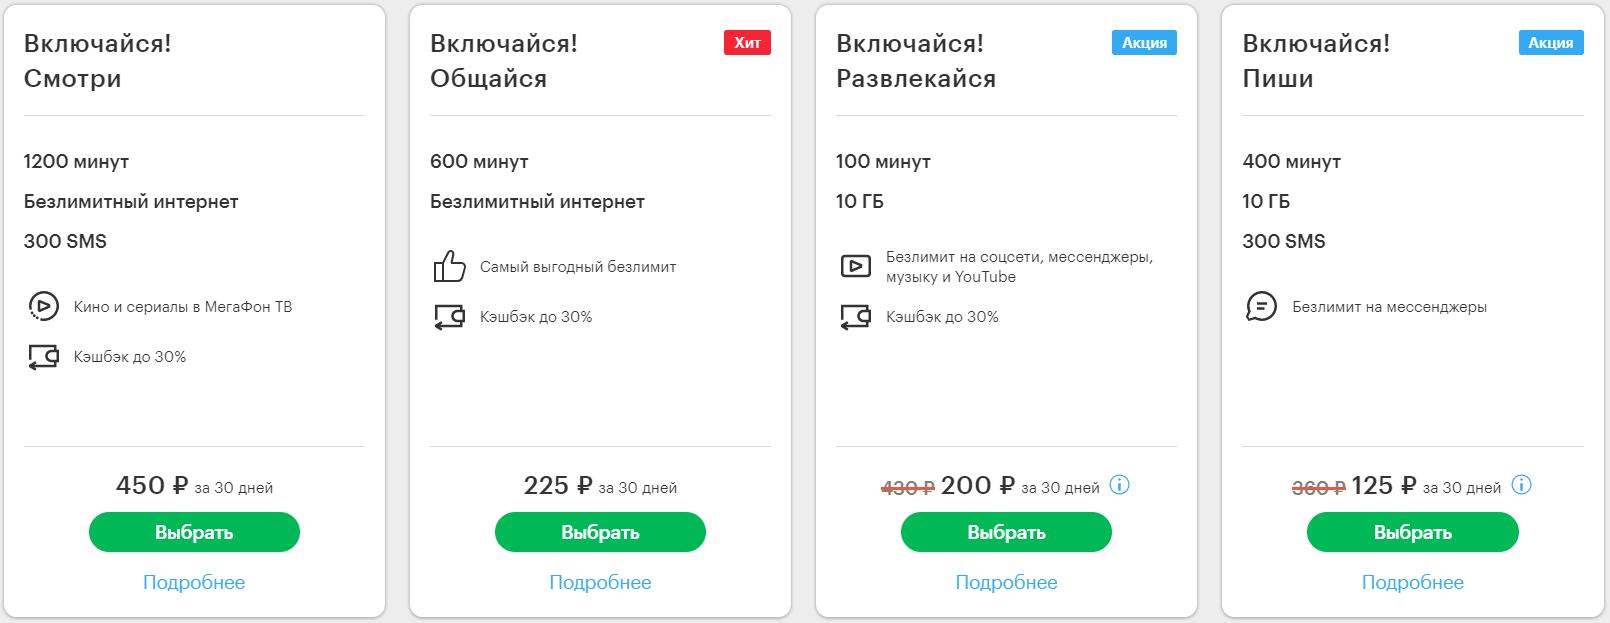 meg-ivanovo.png